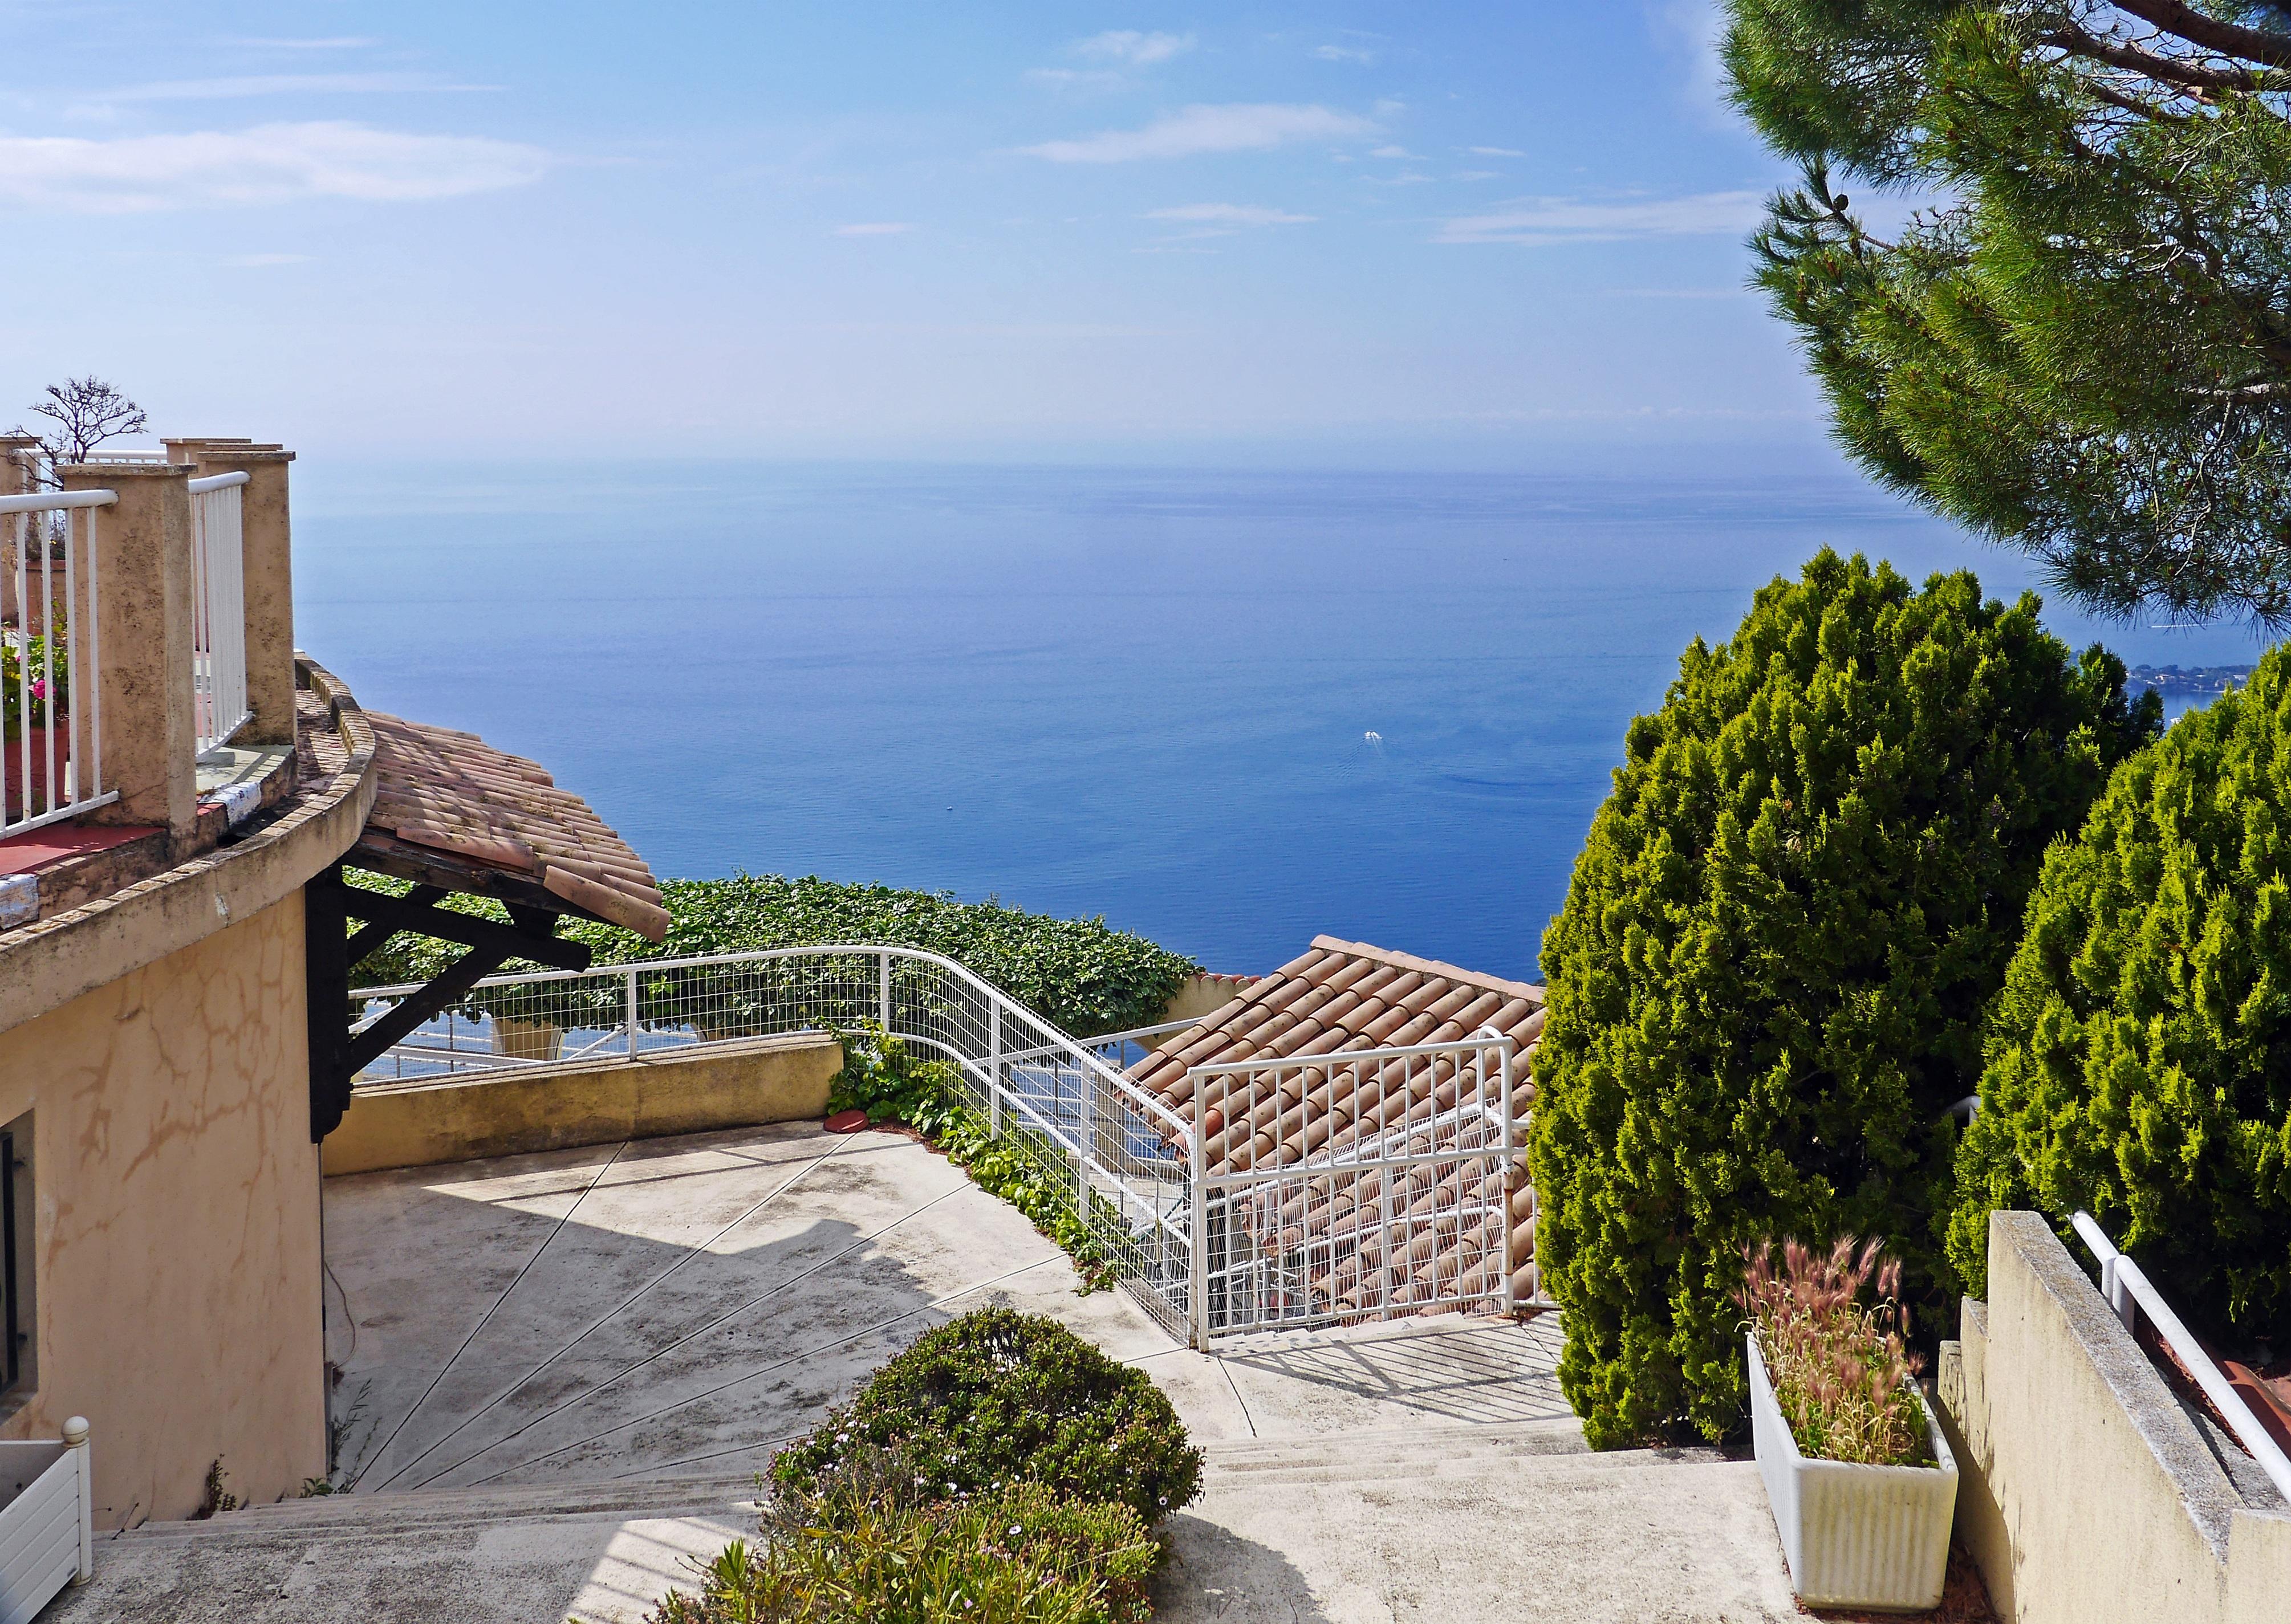 Free Images : landscape, sea, coast, water, horizon, villa, view ...